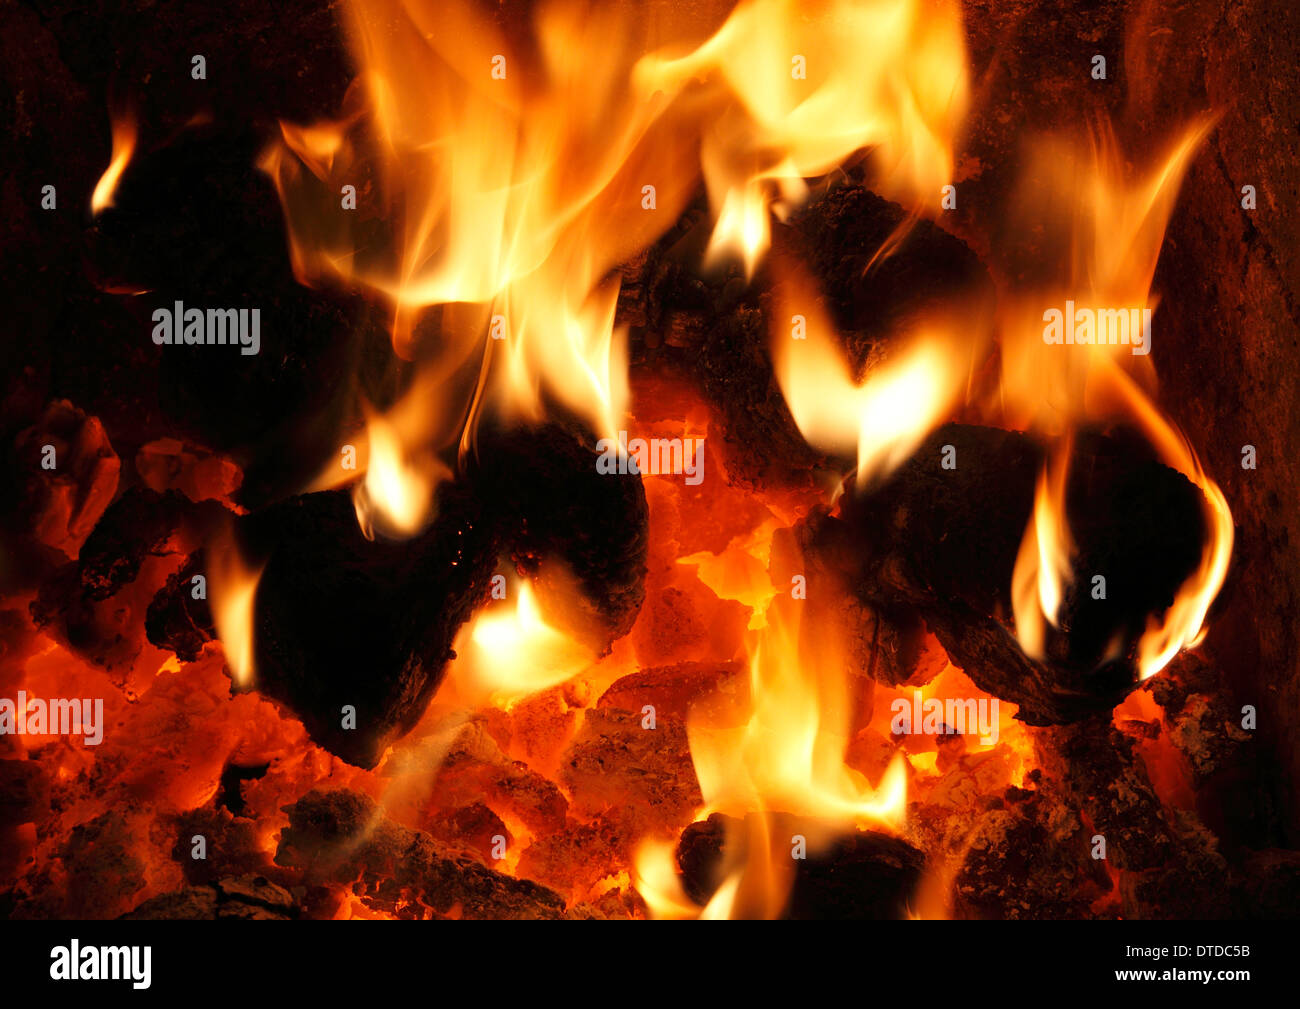 Feste Brennstoffe, heimische Kohle, Feuer, Flamme, Flammen Herz Kamin Wärme Energie macht Feuer Wärme Stockbild